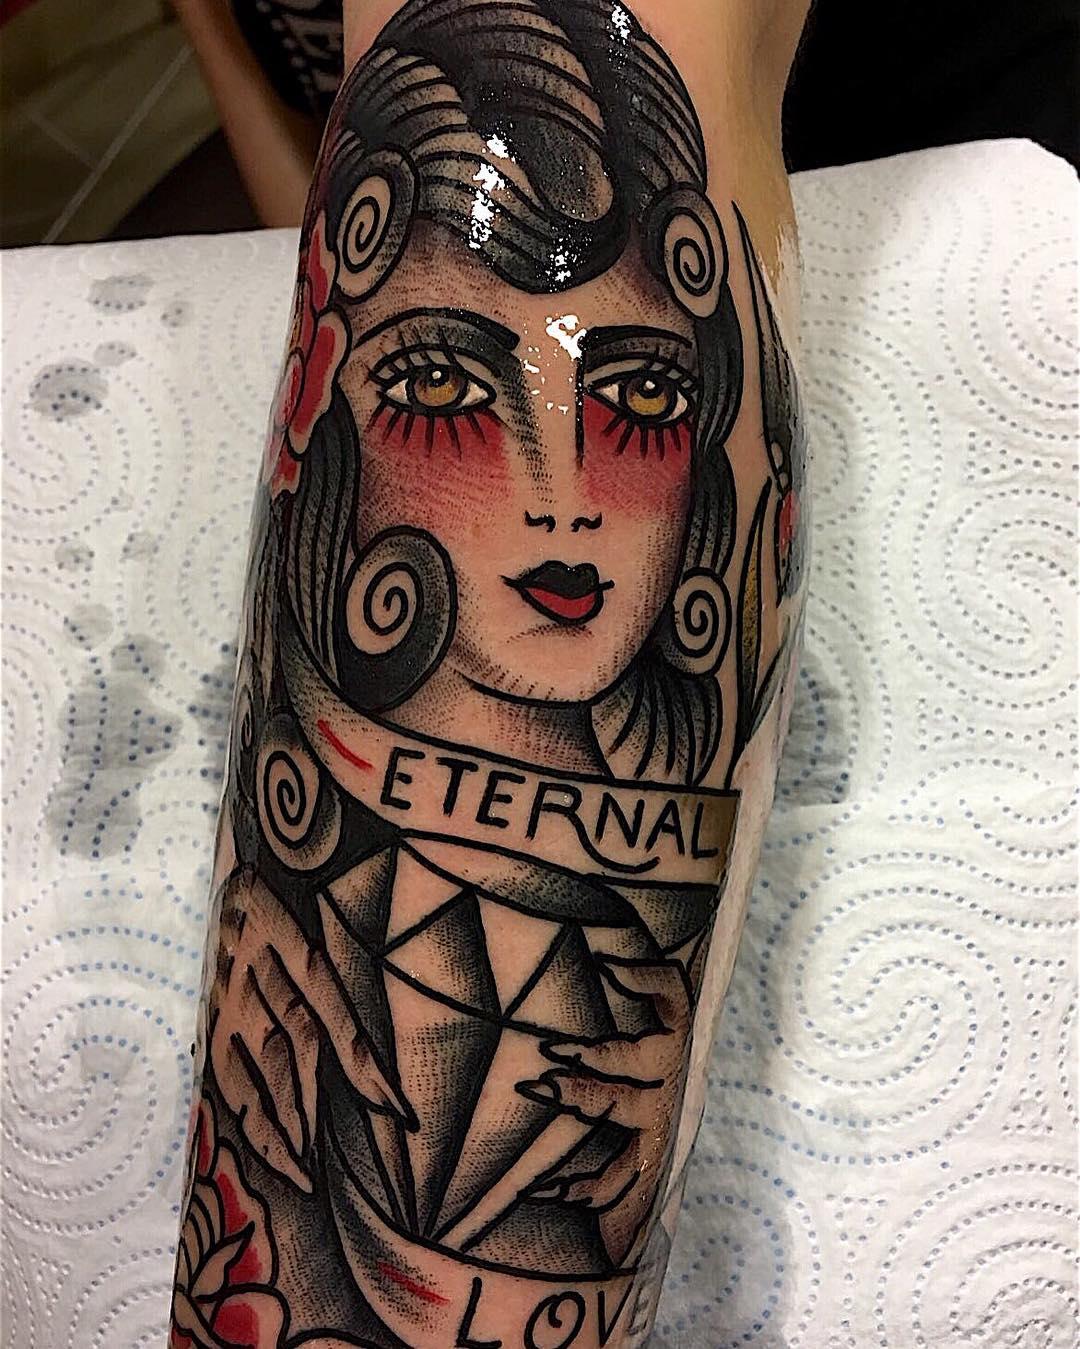 tattooart,art,artistic,old,oldschollshit,custommade,owl,tabasco,berlintattoo,barcelonatattoo,ibizatattoo,tabascotattooer,bestattooers,tradicionaltattooers,bestisbest,tatuajes,berlintattooers,ontheroad,classictattoo,tendencia,creativity,bobinas,tradicional,studyofberlin,tattooart,art,artistic,old,oldschollshit,custommade,owl,tabasco,berlintattoo,barcelonatattoo,ibizatattoo,tabascotattooer,bestattooers,tradicionaltattooers,bestisbest,tatuajes,berlintattooers,ontheroad,classictattoo,tendencia,creativity,bobinas,tradicional,studyofberlin